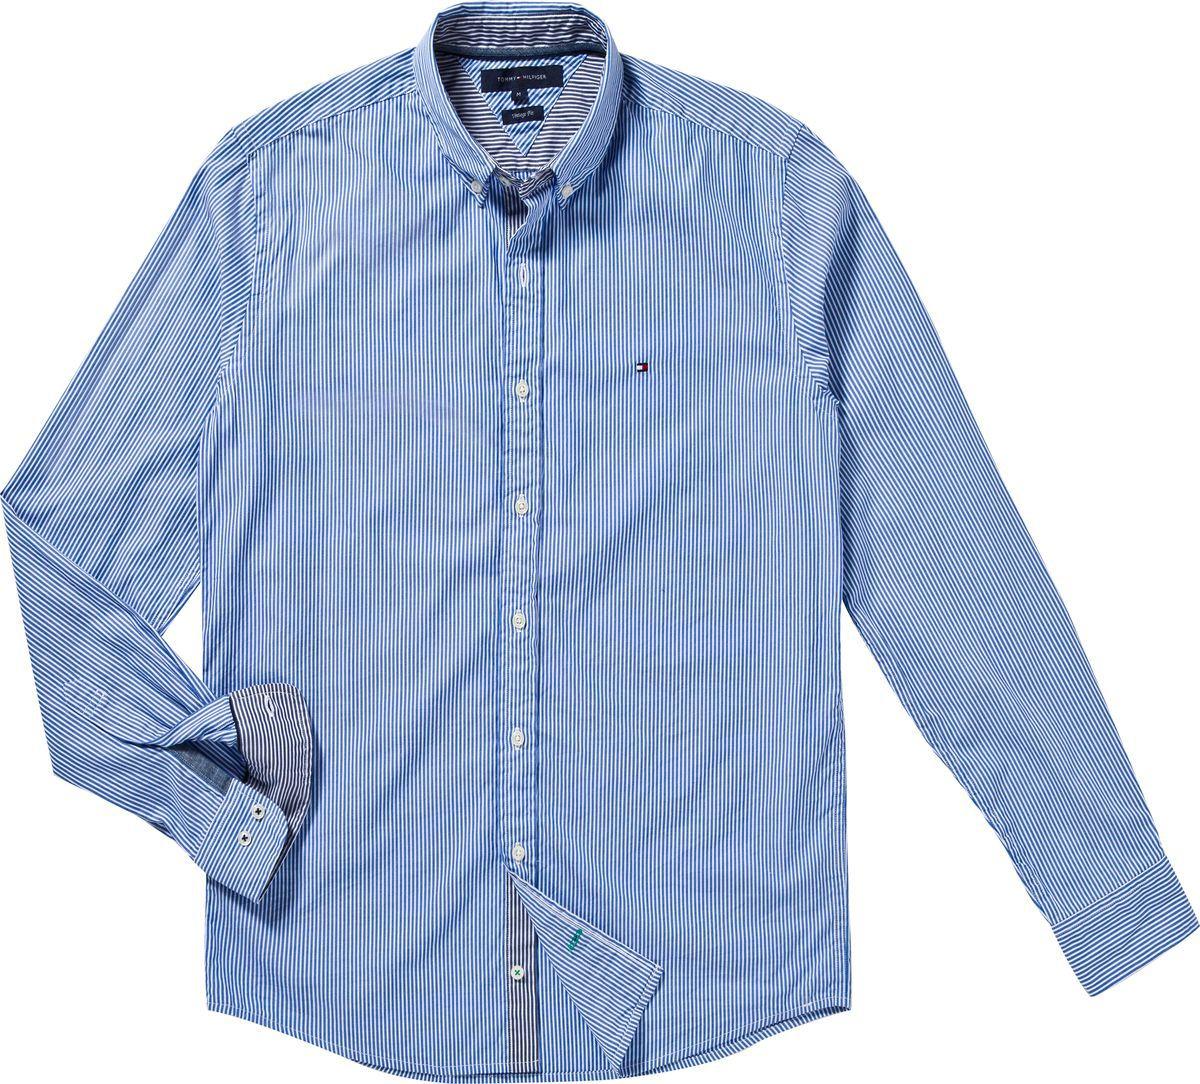 Tommy hilfiger lexington stripe shirt in blue for men lyst for Tommy hilfiger fitzgerald striped shirt